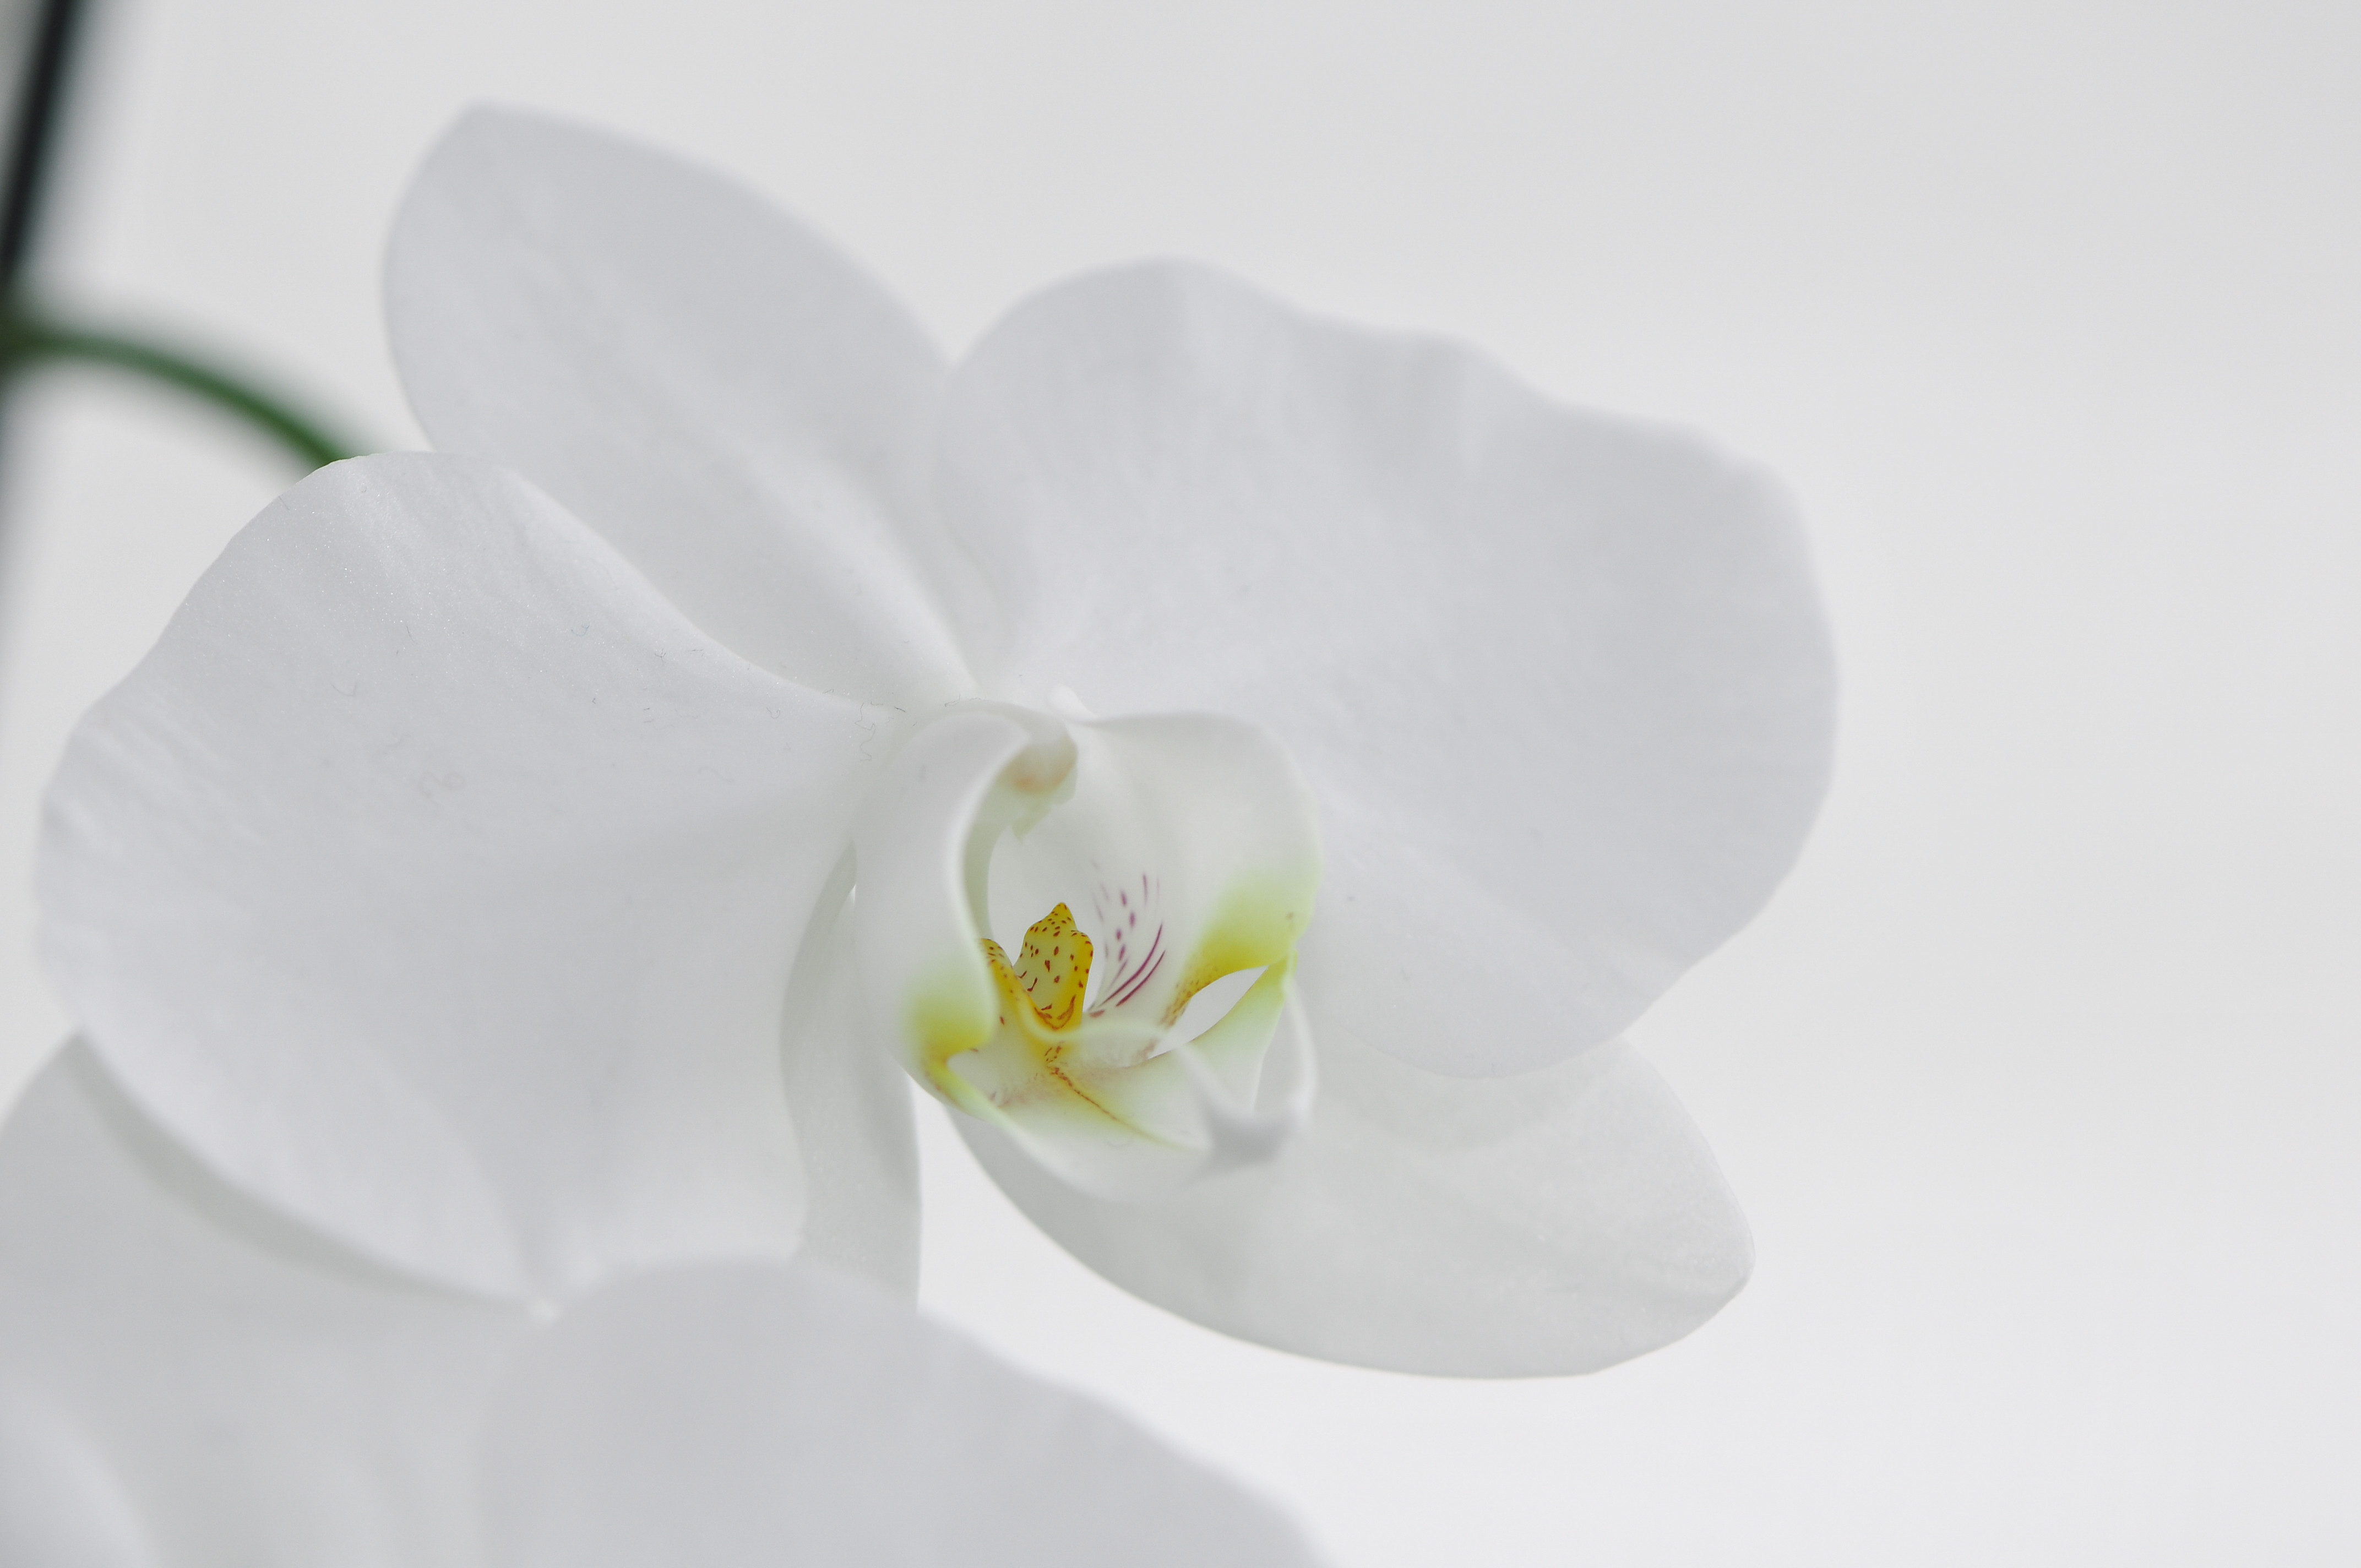 file nachtfalter orchidee phalaenopsis 06 jpg wikimedia. Black Bedroom Furniture Sets. Home Design Ideas